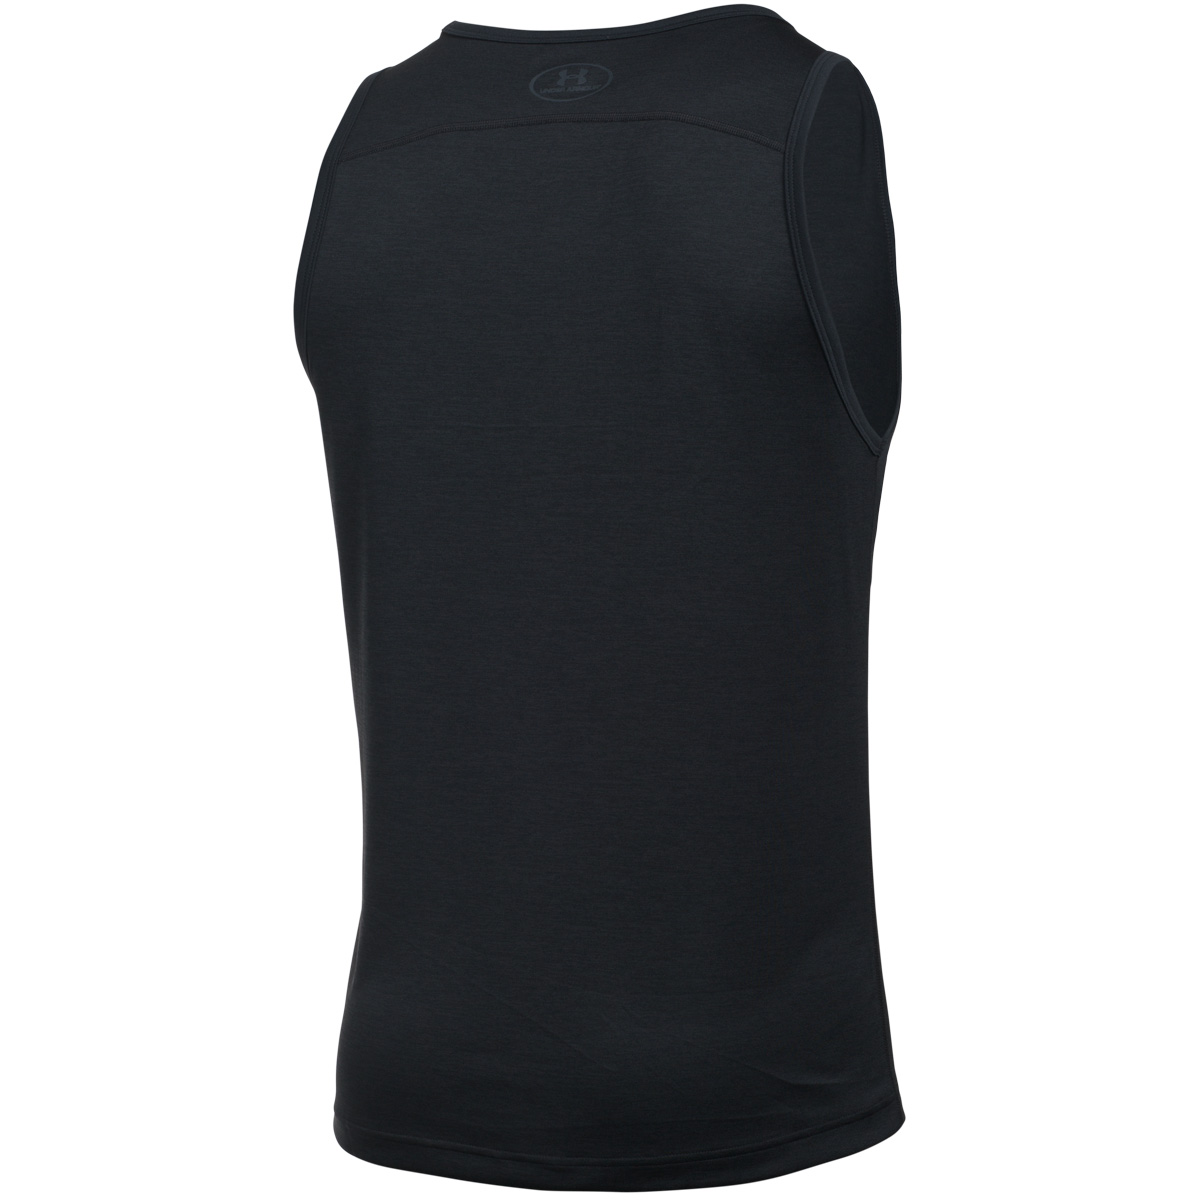 Under Armour Mens HeatGear UA Tech Ultra Soft Ant-Odor Loose Tank Top Vest